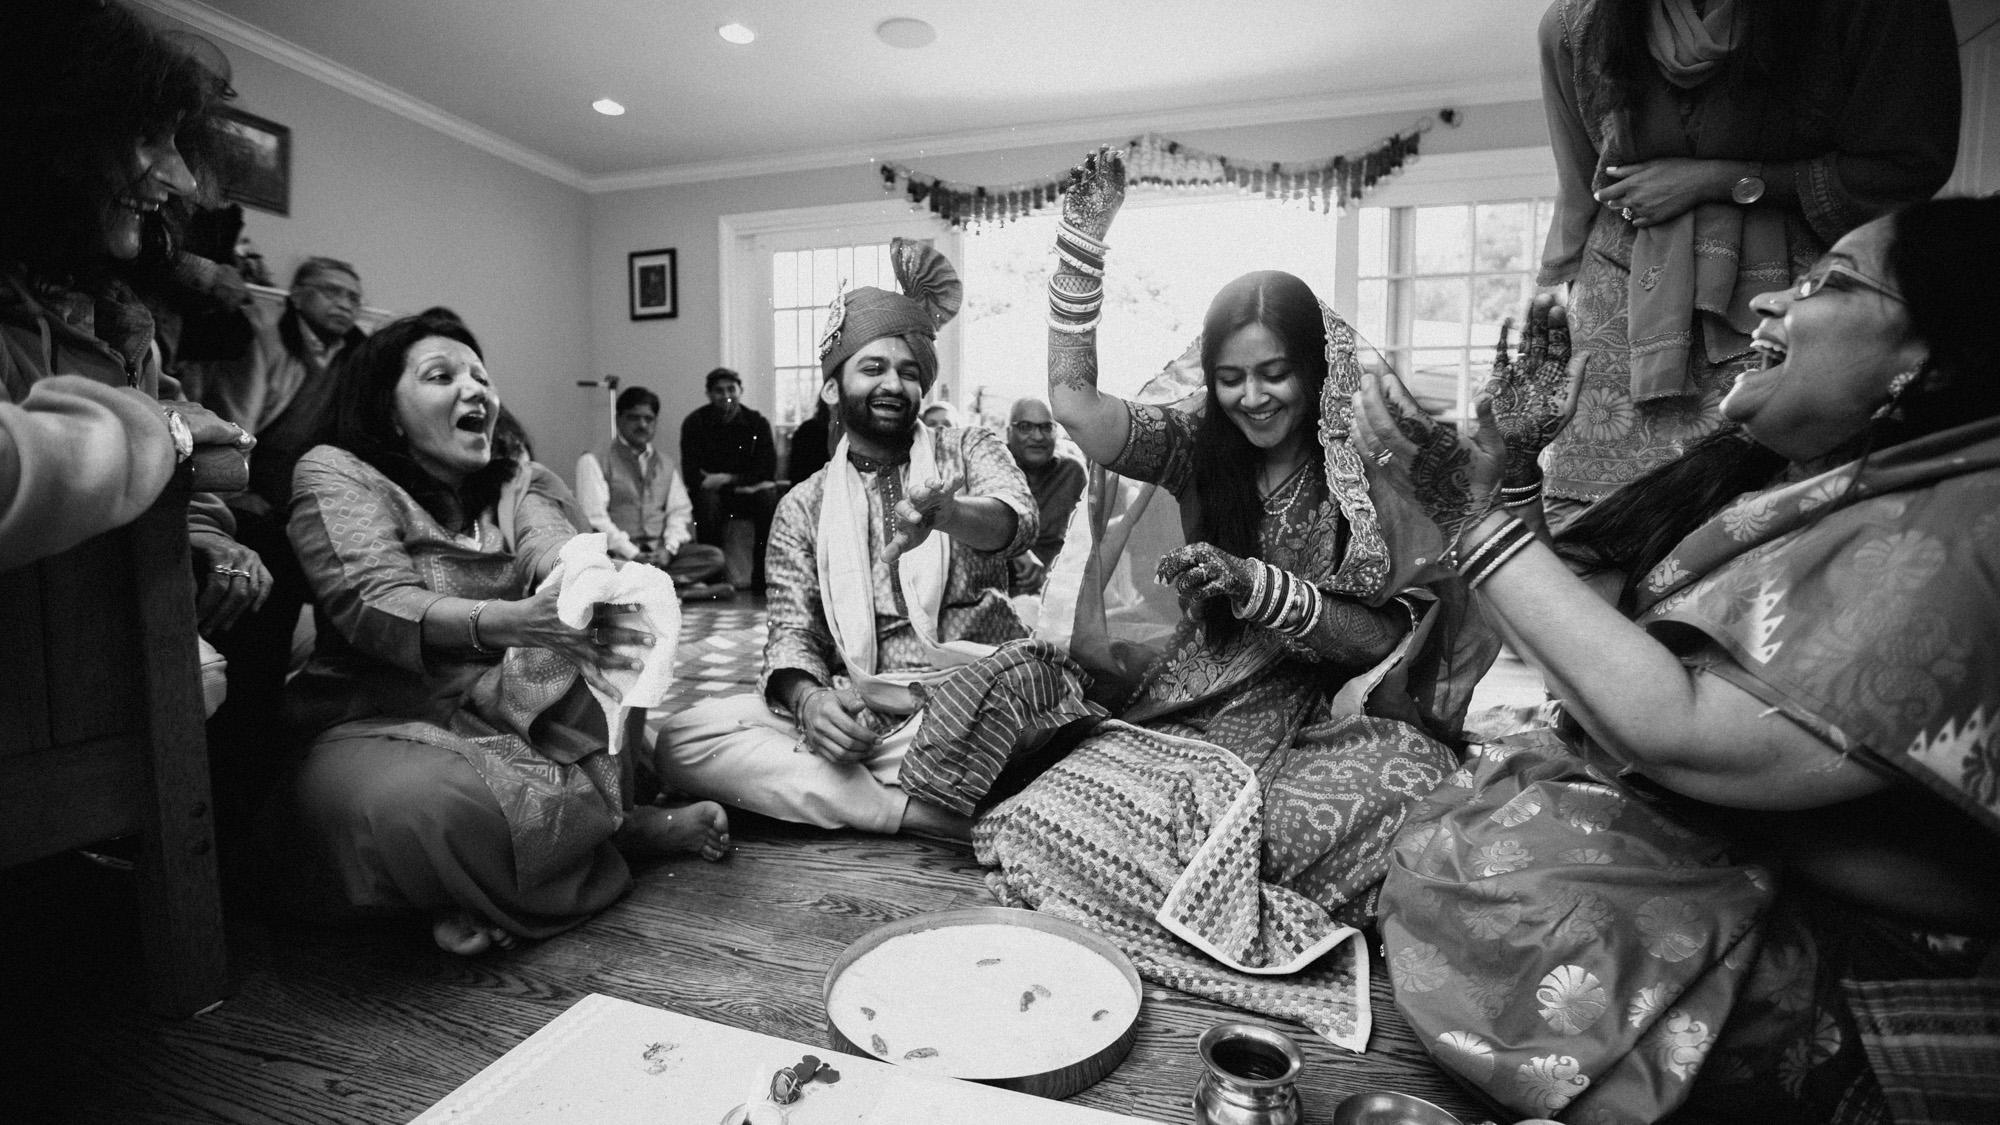 anu_maneesh_alec_vanderboom_Indian_wedding_photography-0192.jpg